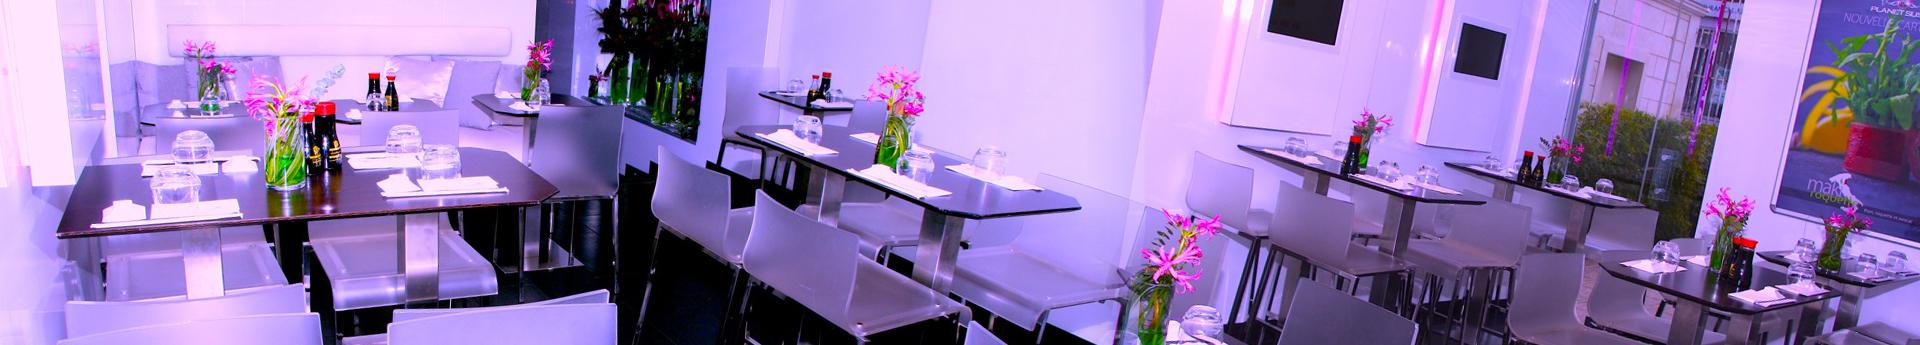 planet sushi strasbourg livraison de sushi dans le 67. Black Bedroom Furniture Sets. Home Design Ideas